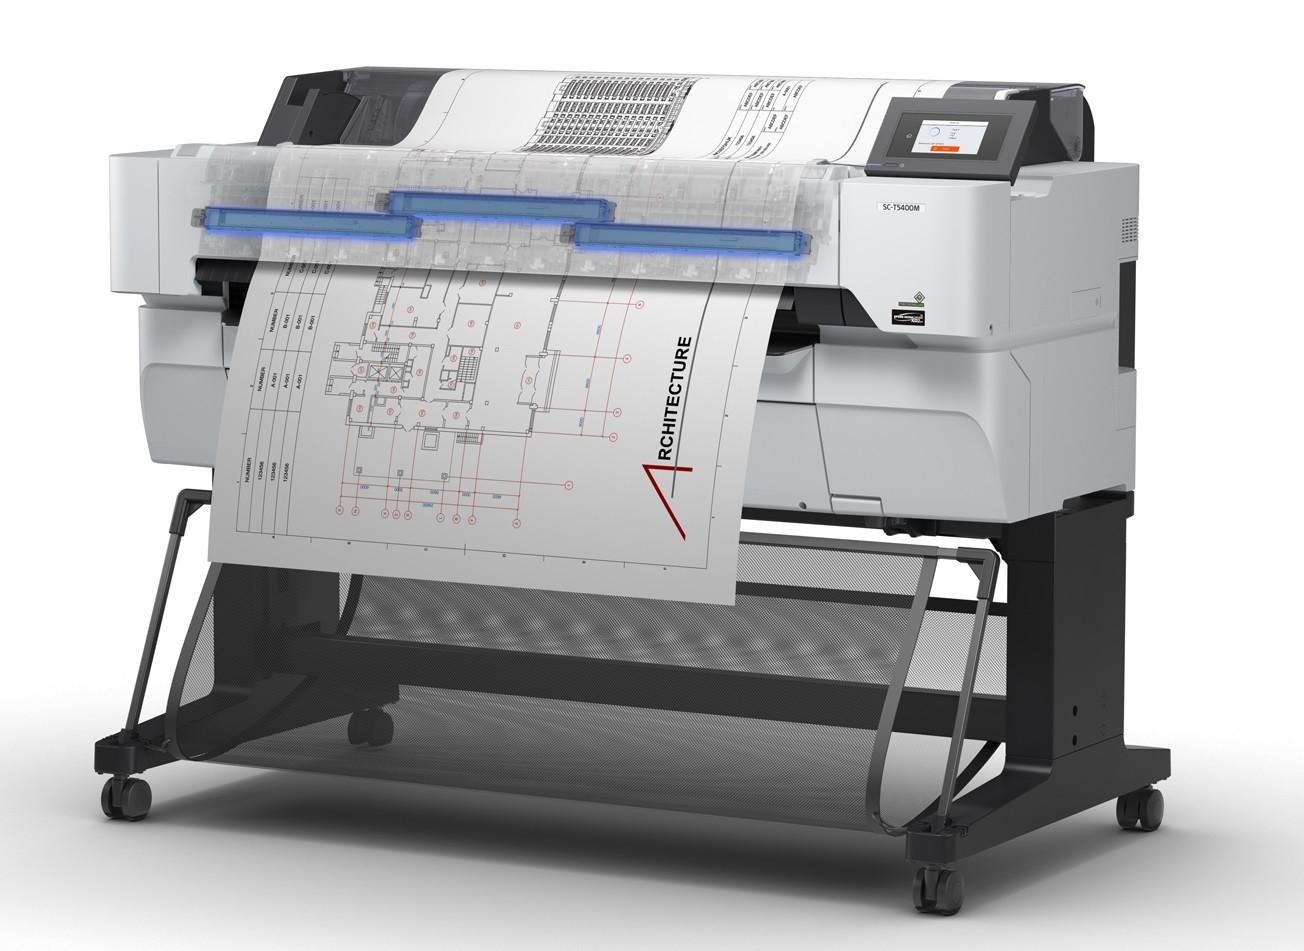 Epson SC-T5400M Scanner